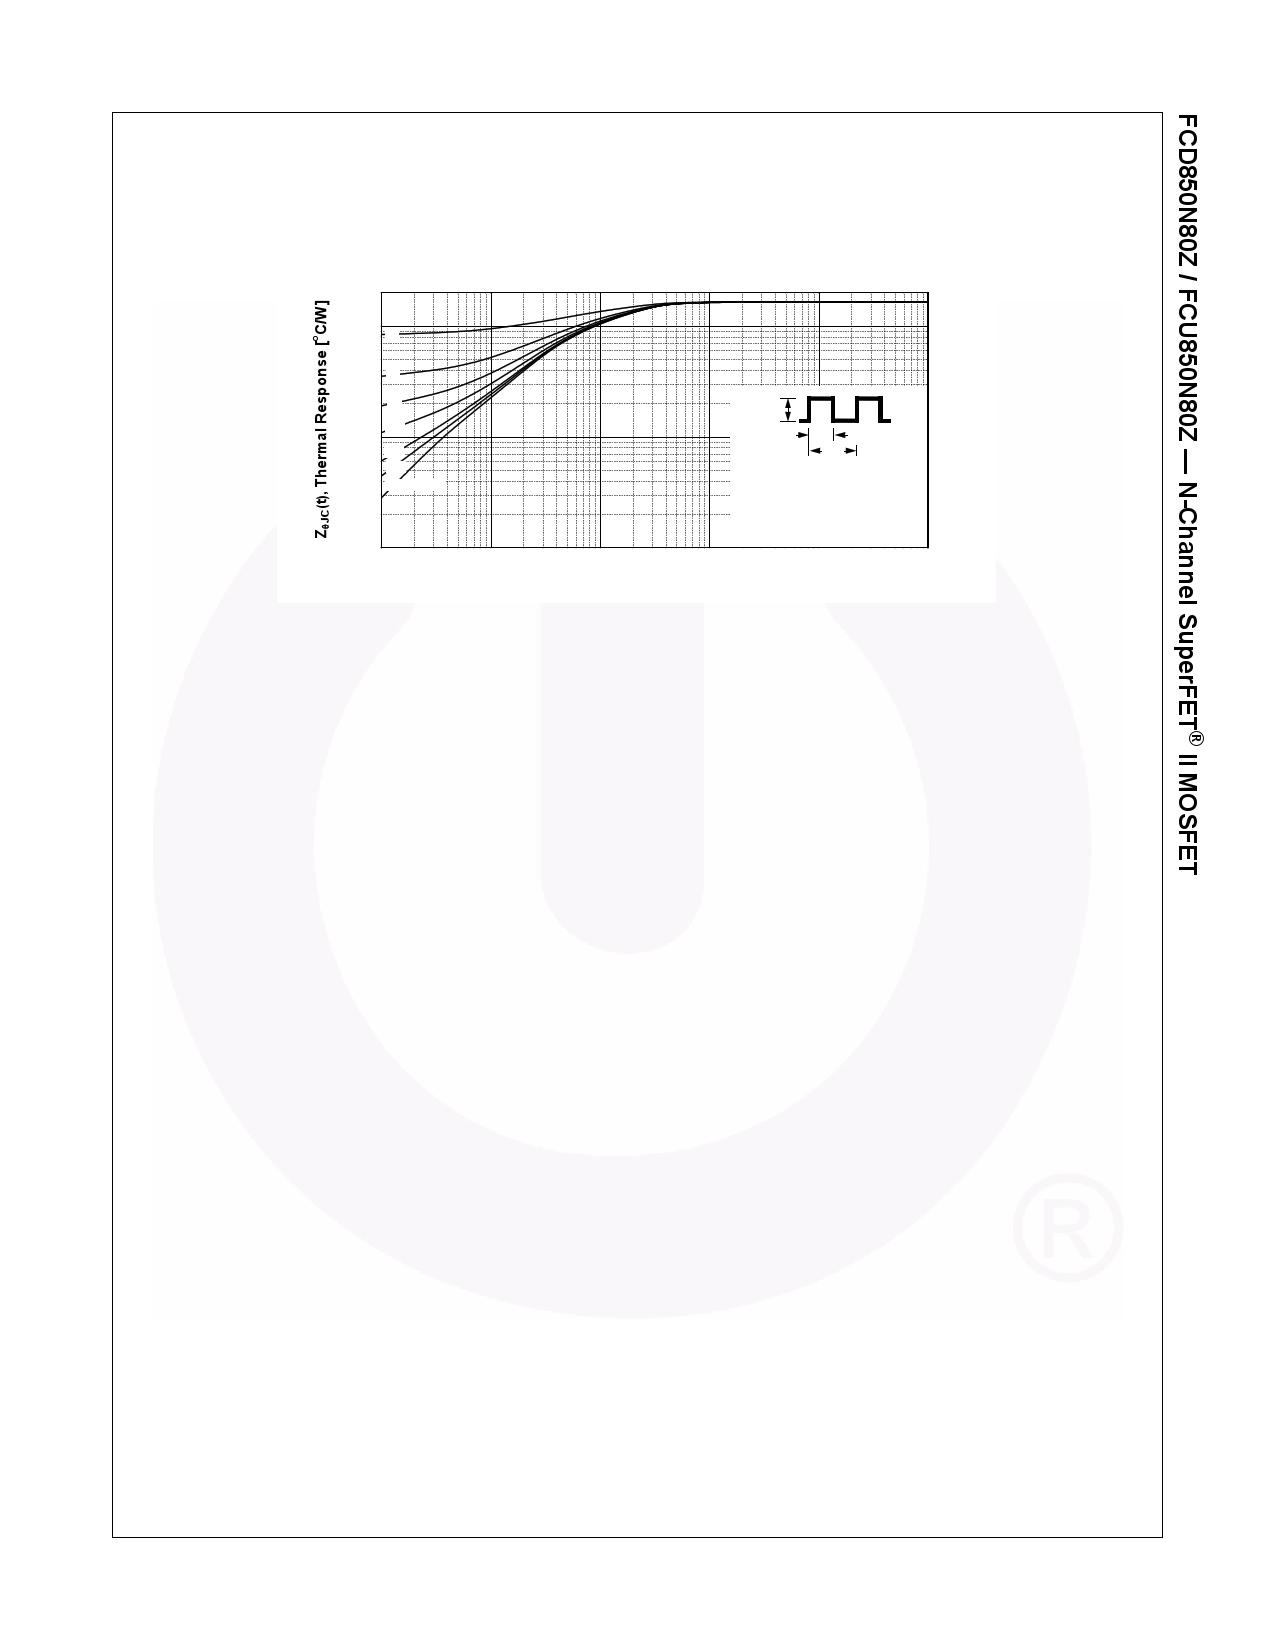 FCU850N80Z pdf, arduino